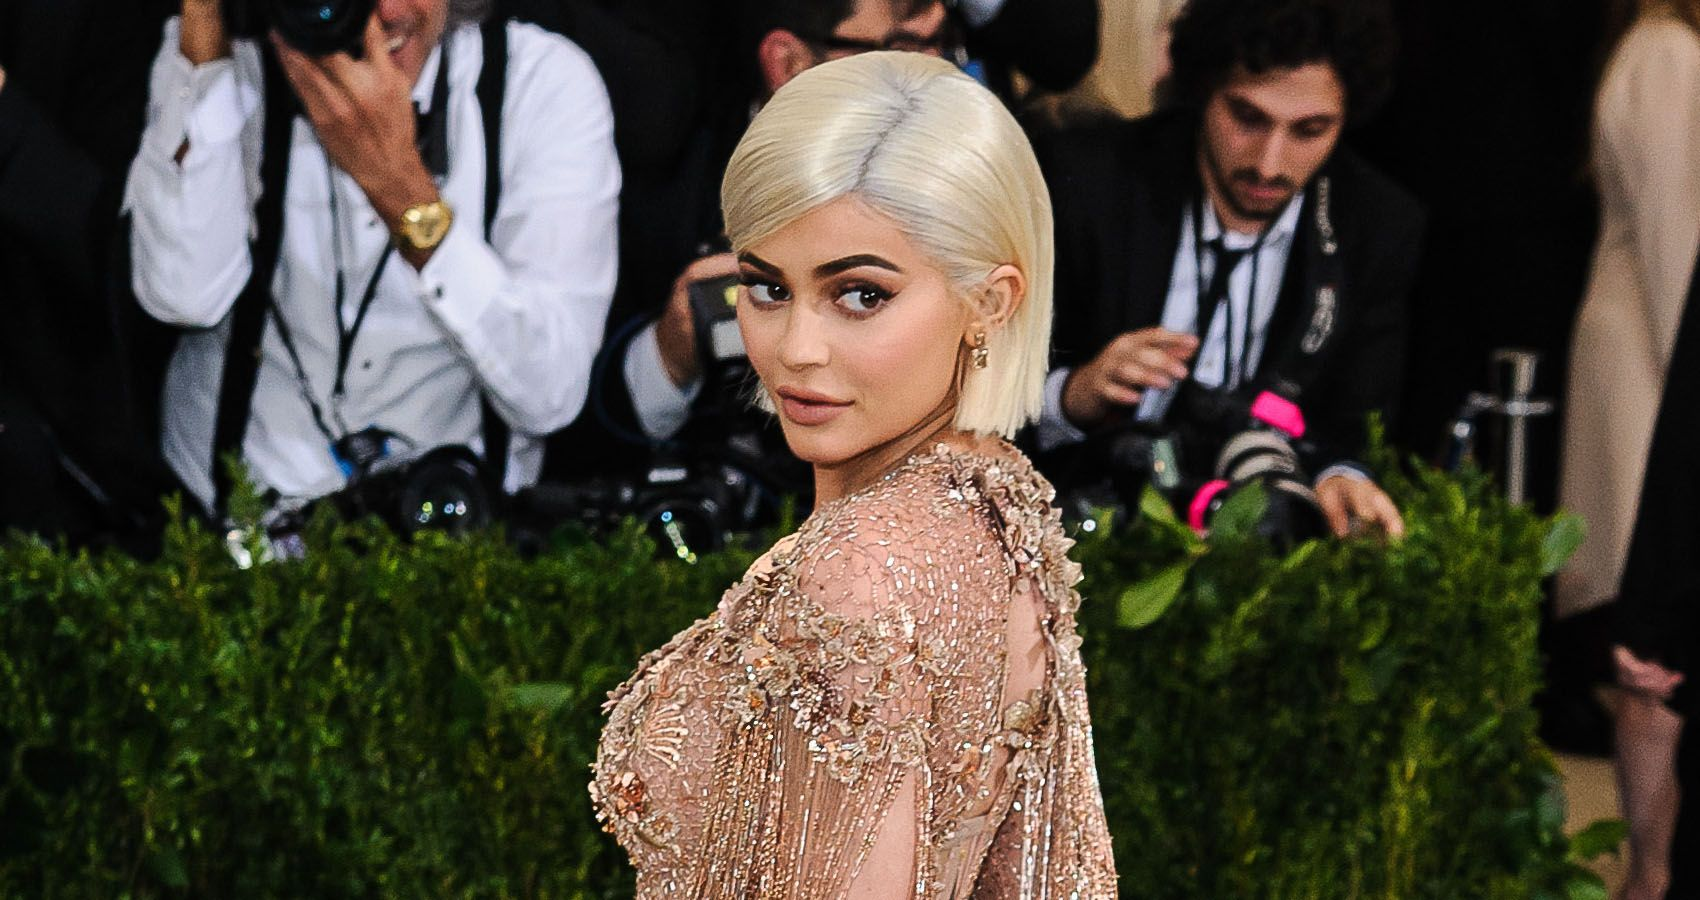 Kylie Jenner Builds Mansion Near Khloe Kardashian & Kris Jenner's Compound